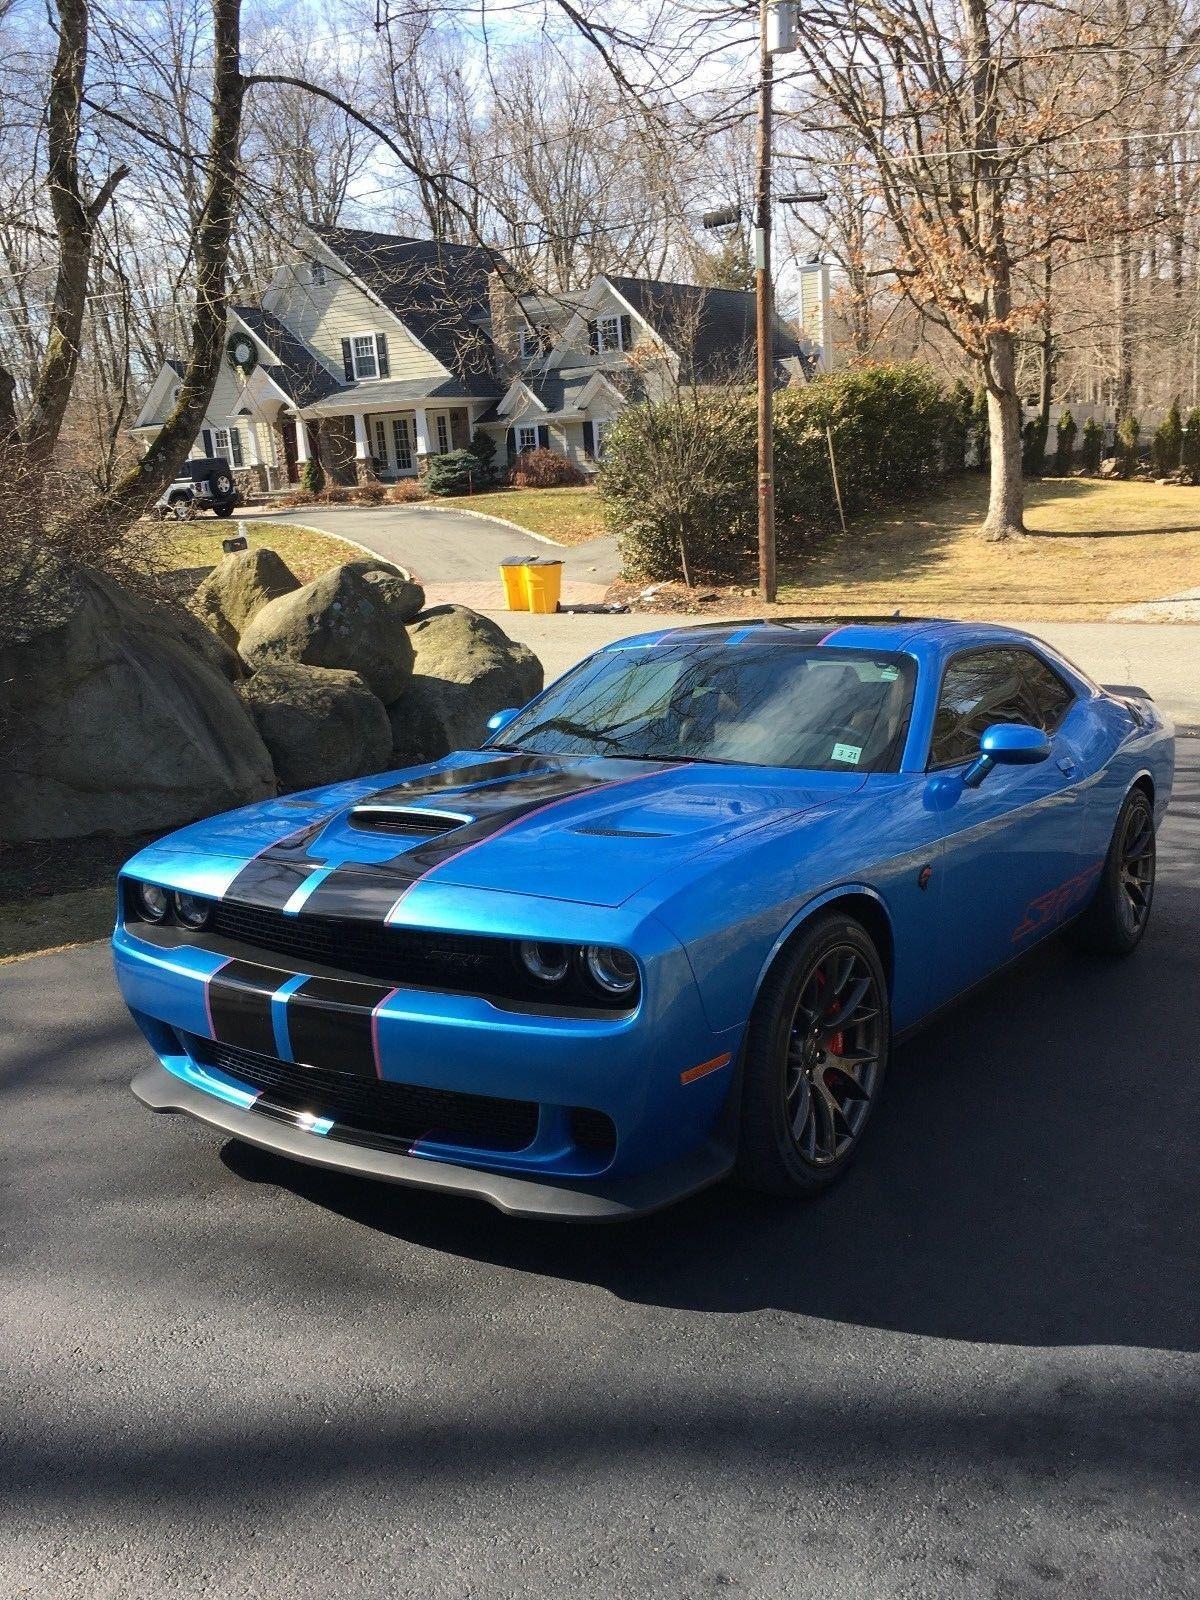 B5 Blue Challenger Hellcat : challenger, hellcat, Dodge, Challenger, Hellcat, LOOKING, 2018-2019, Stock, 24CarShop.com